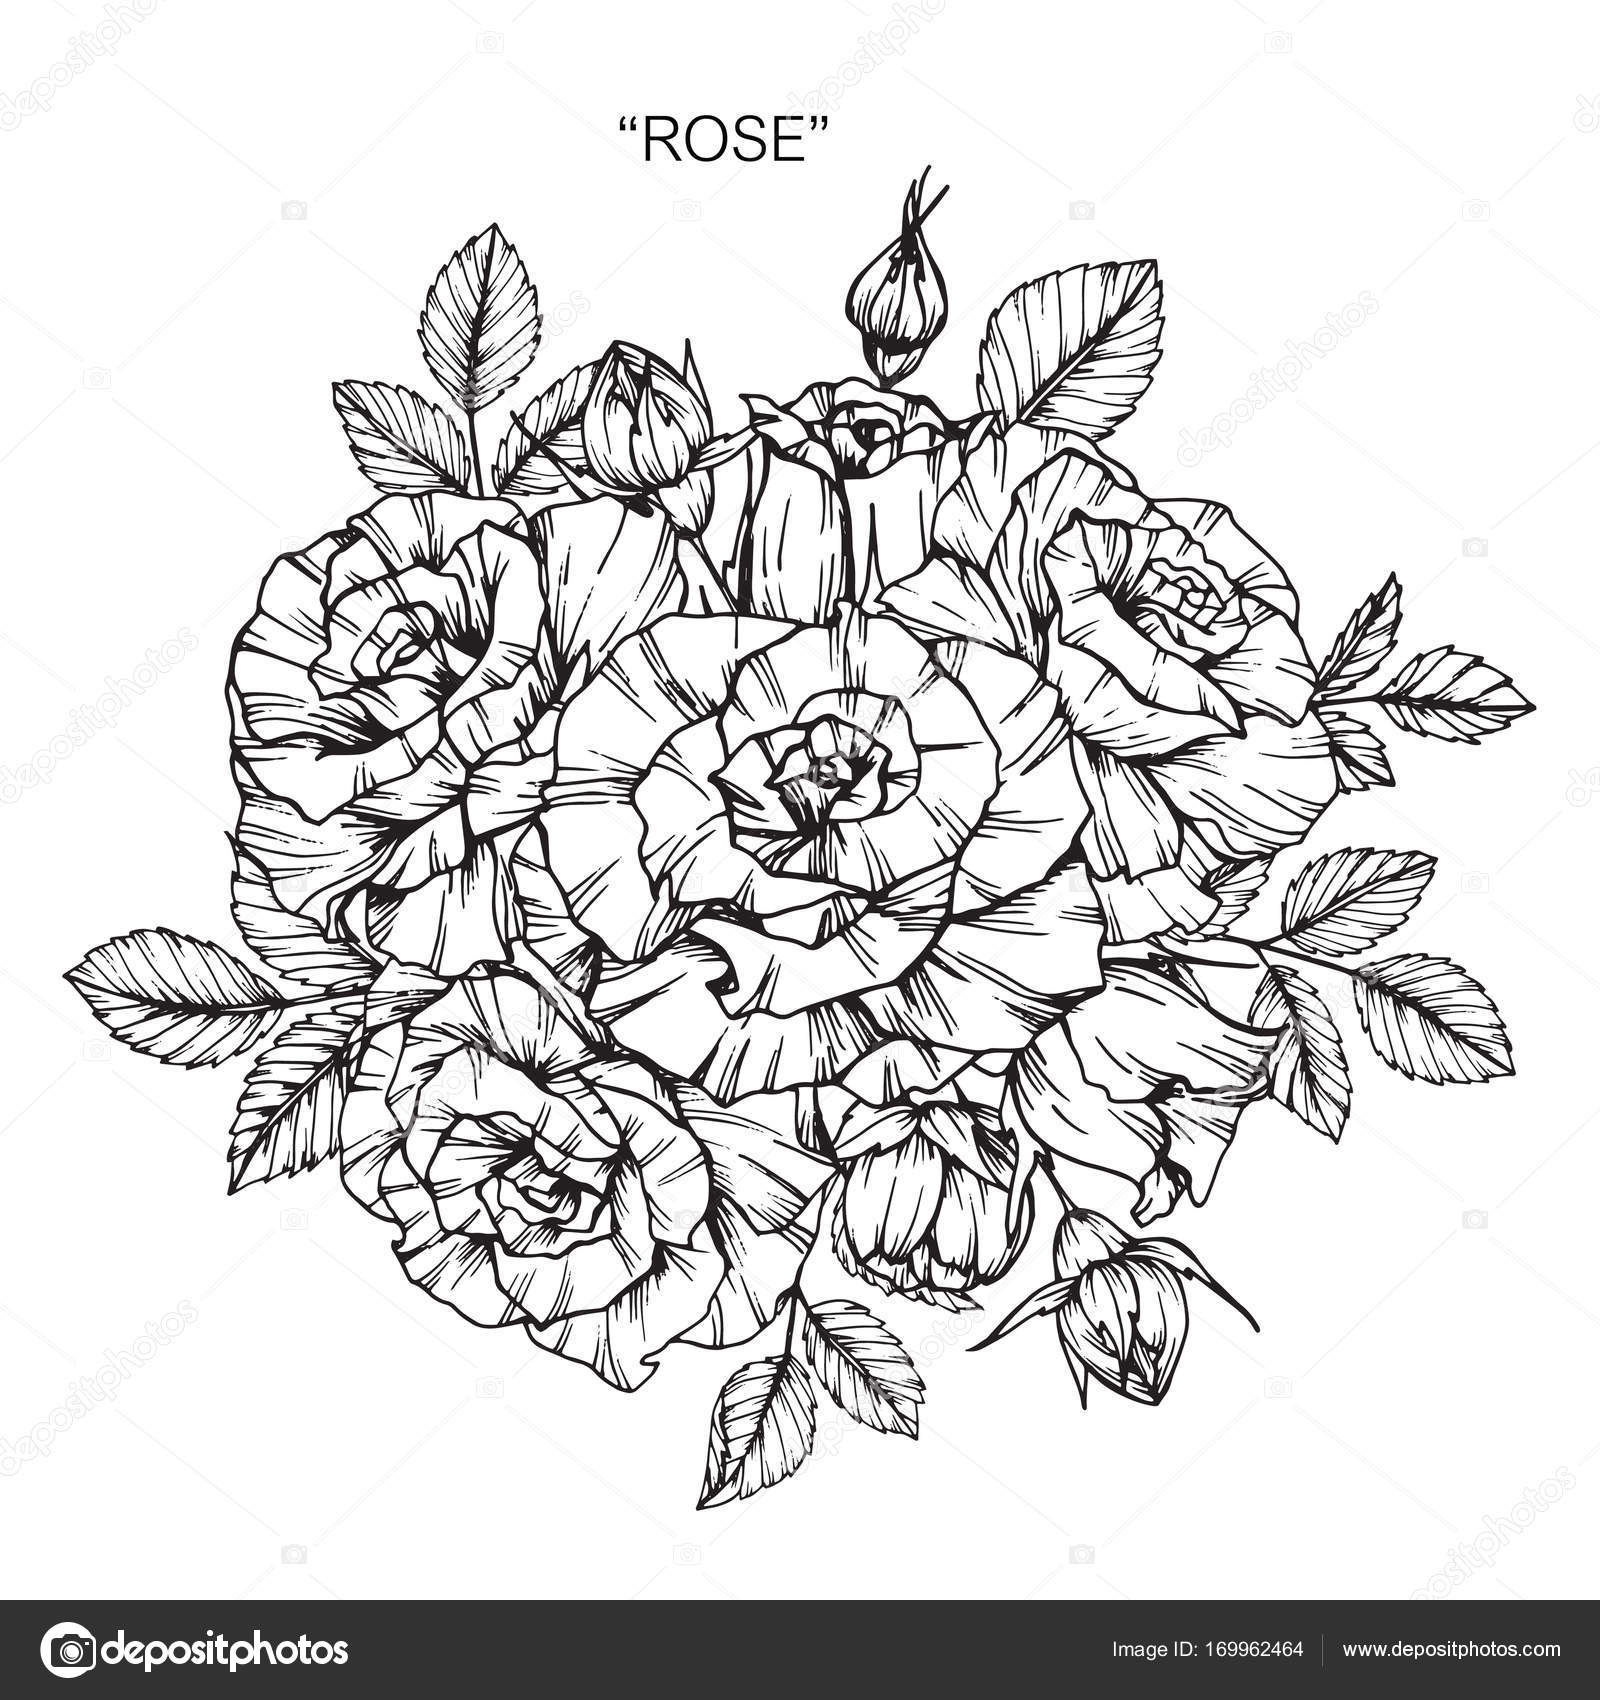 Im genes dibujo de ramo de rosas ramo de rosas dibujo - Dessin de rose a colorier ...